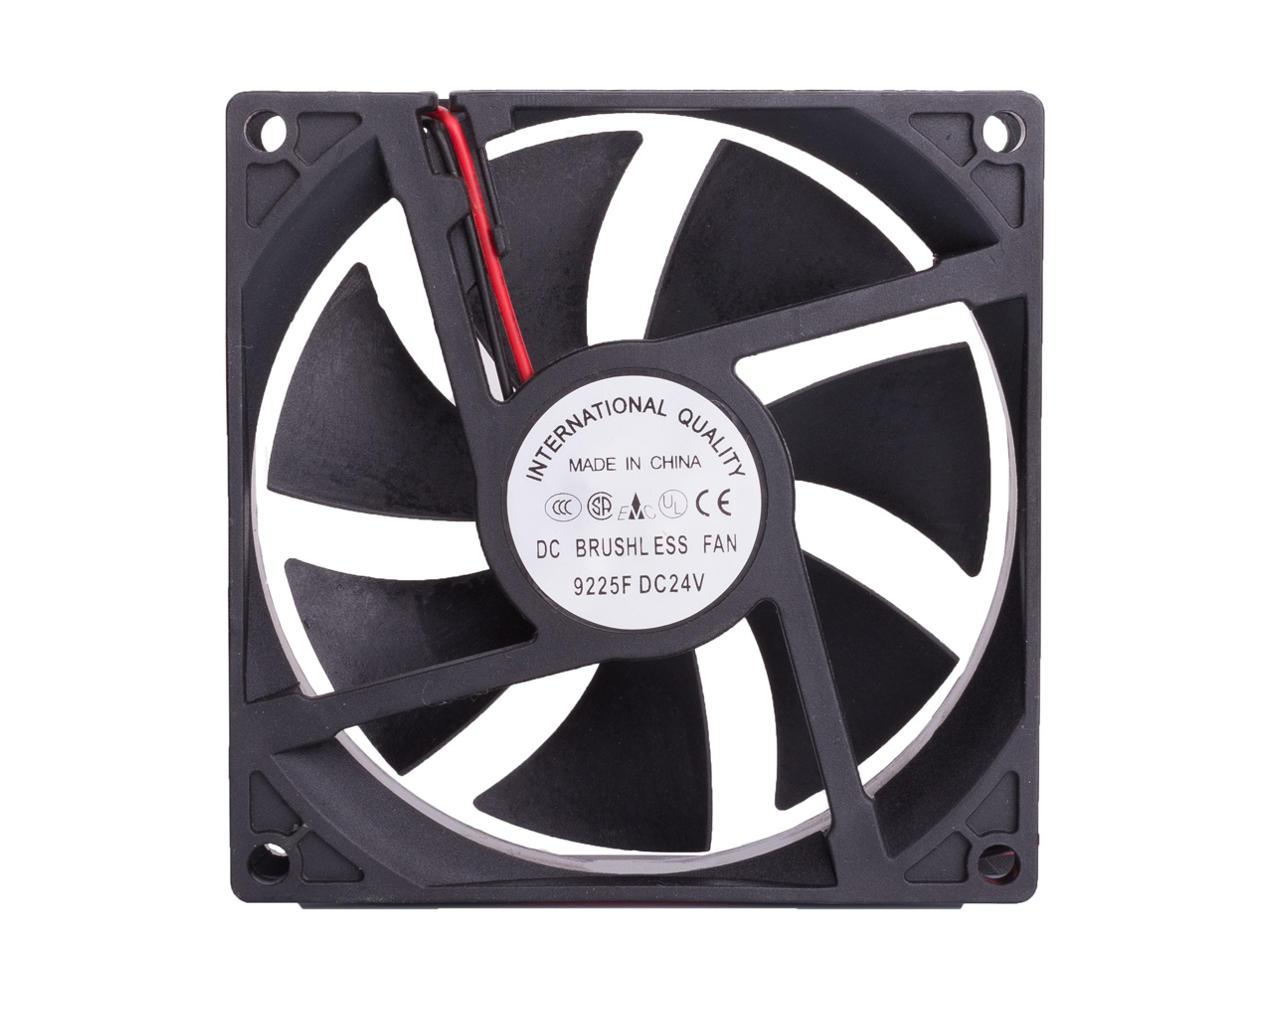 Вентилятор 24 V 90х90х25мм диагональ по болтам 115 мм